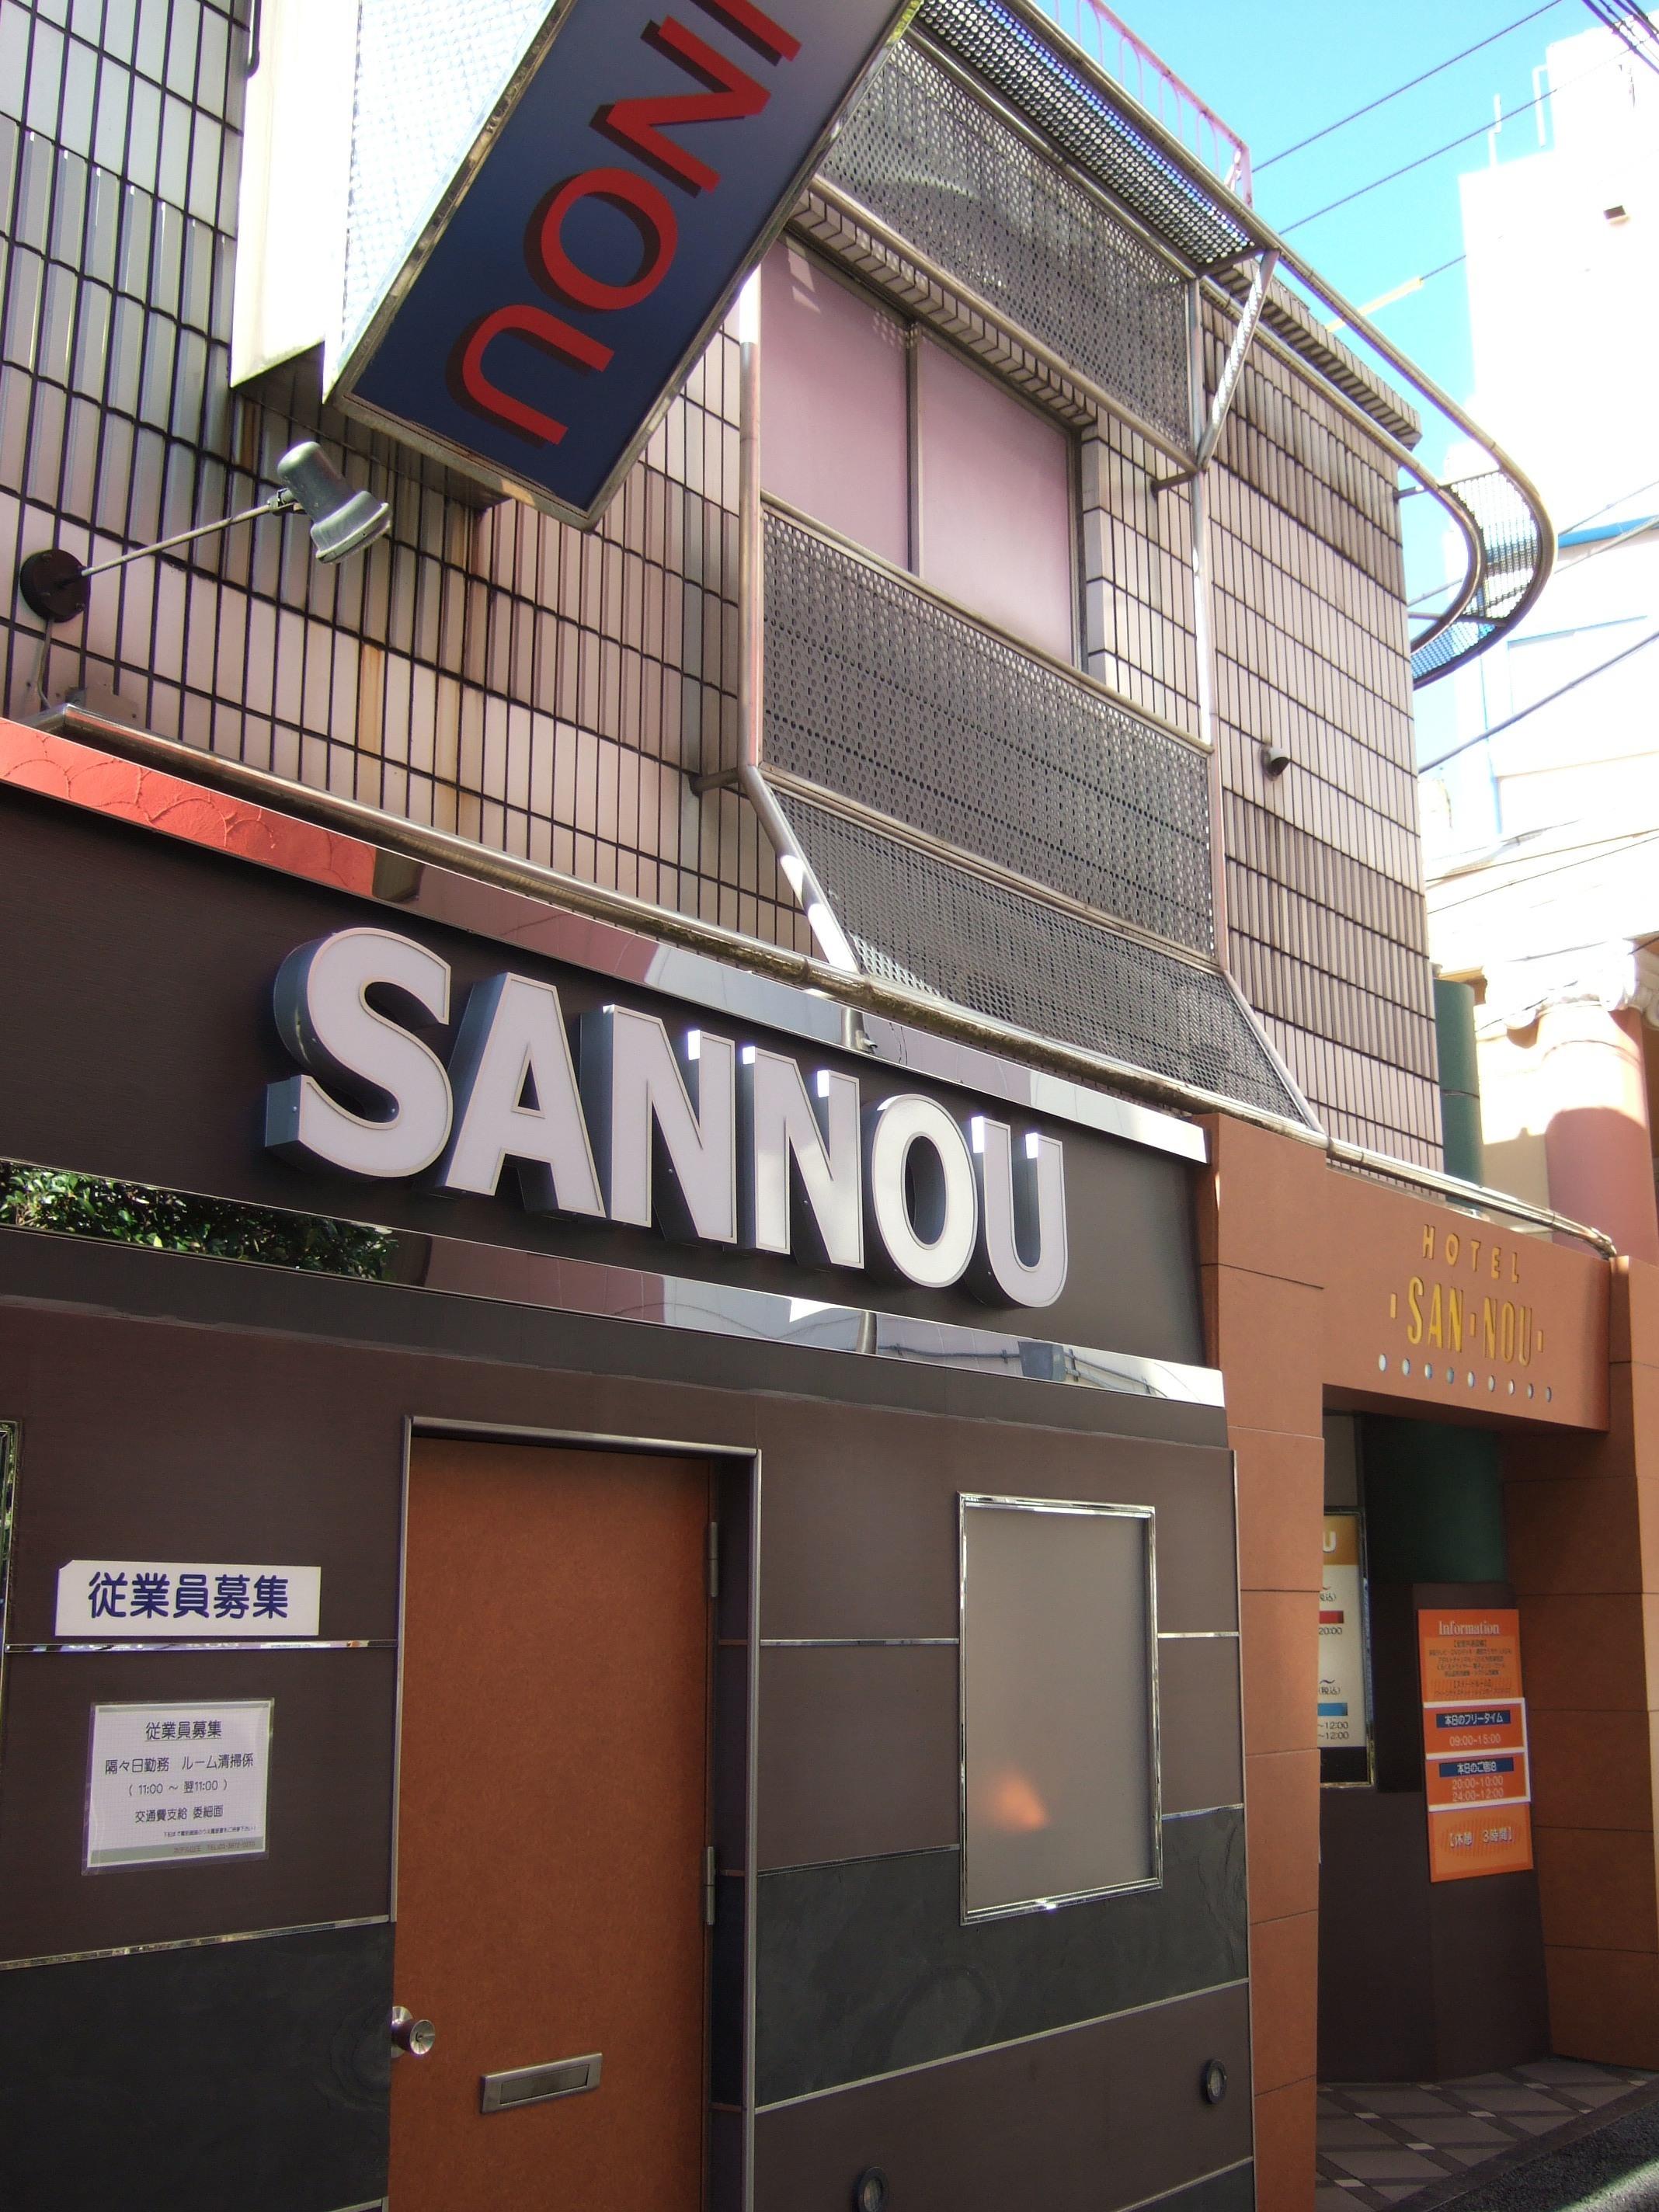 sannou1.jpg